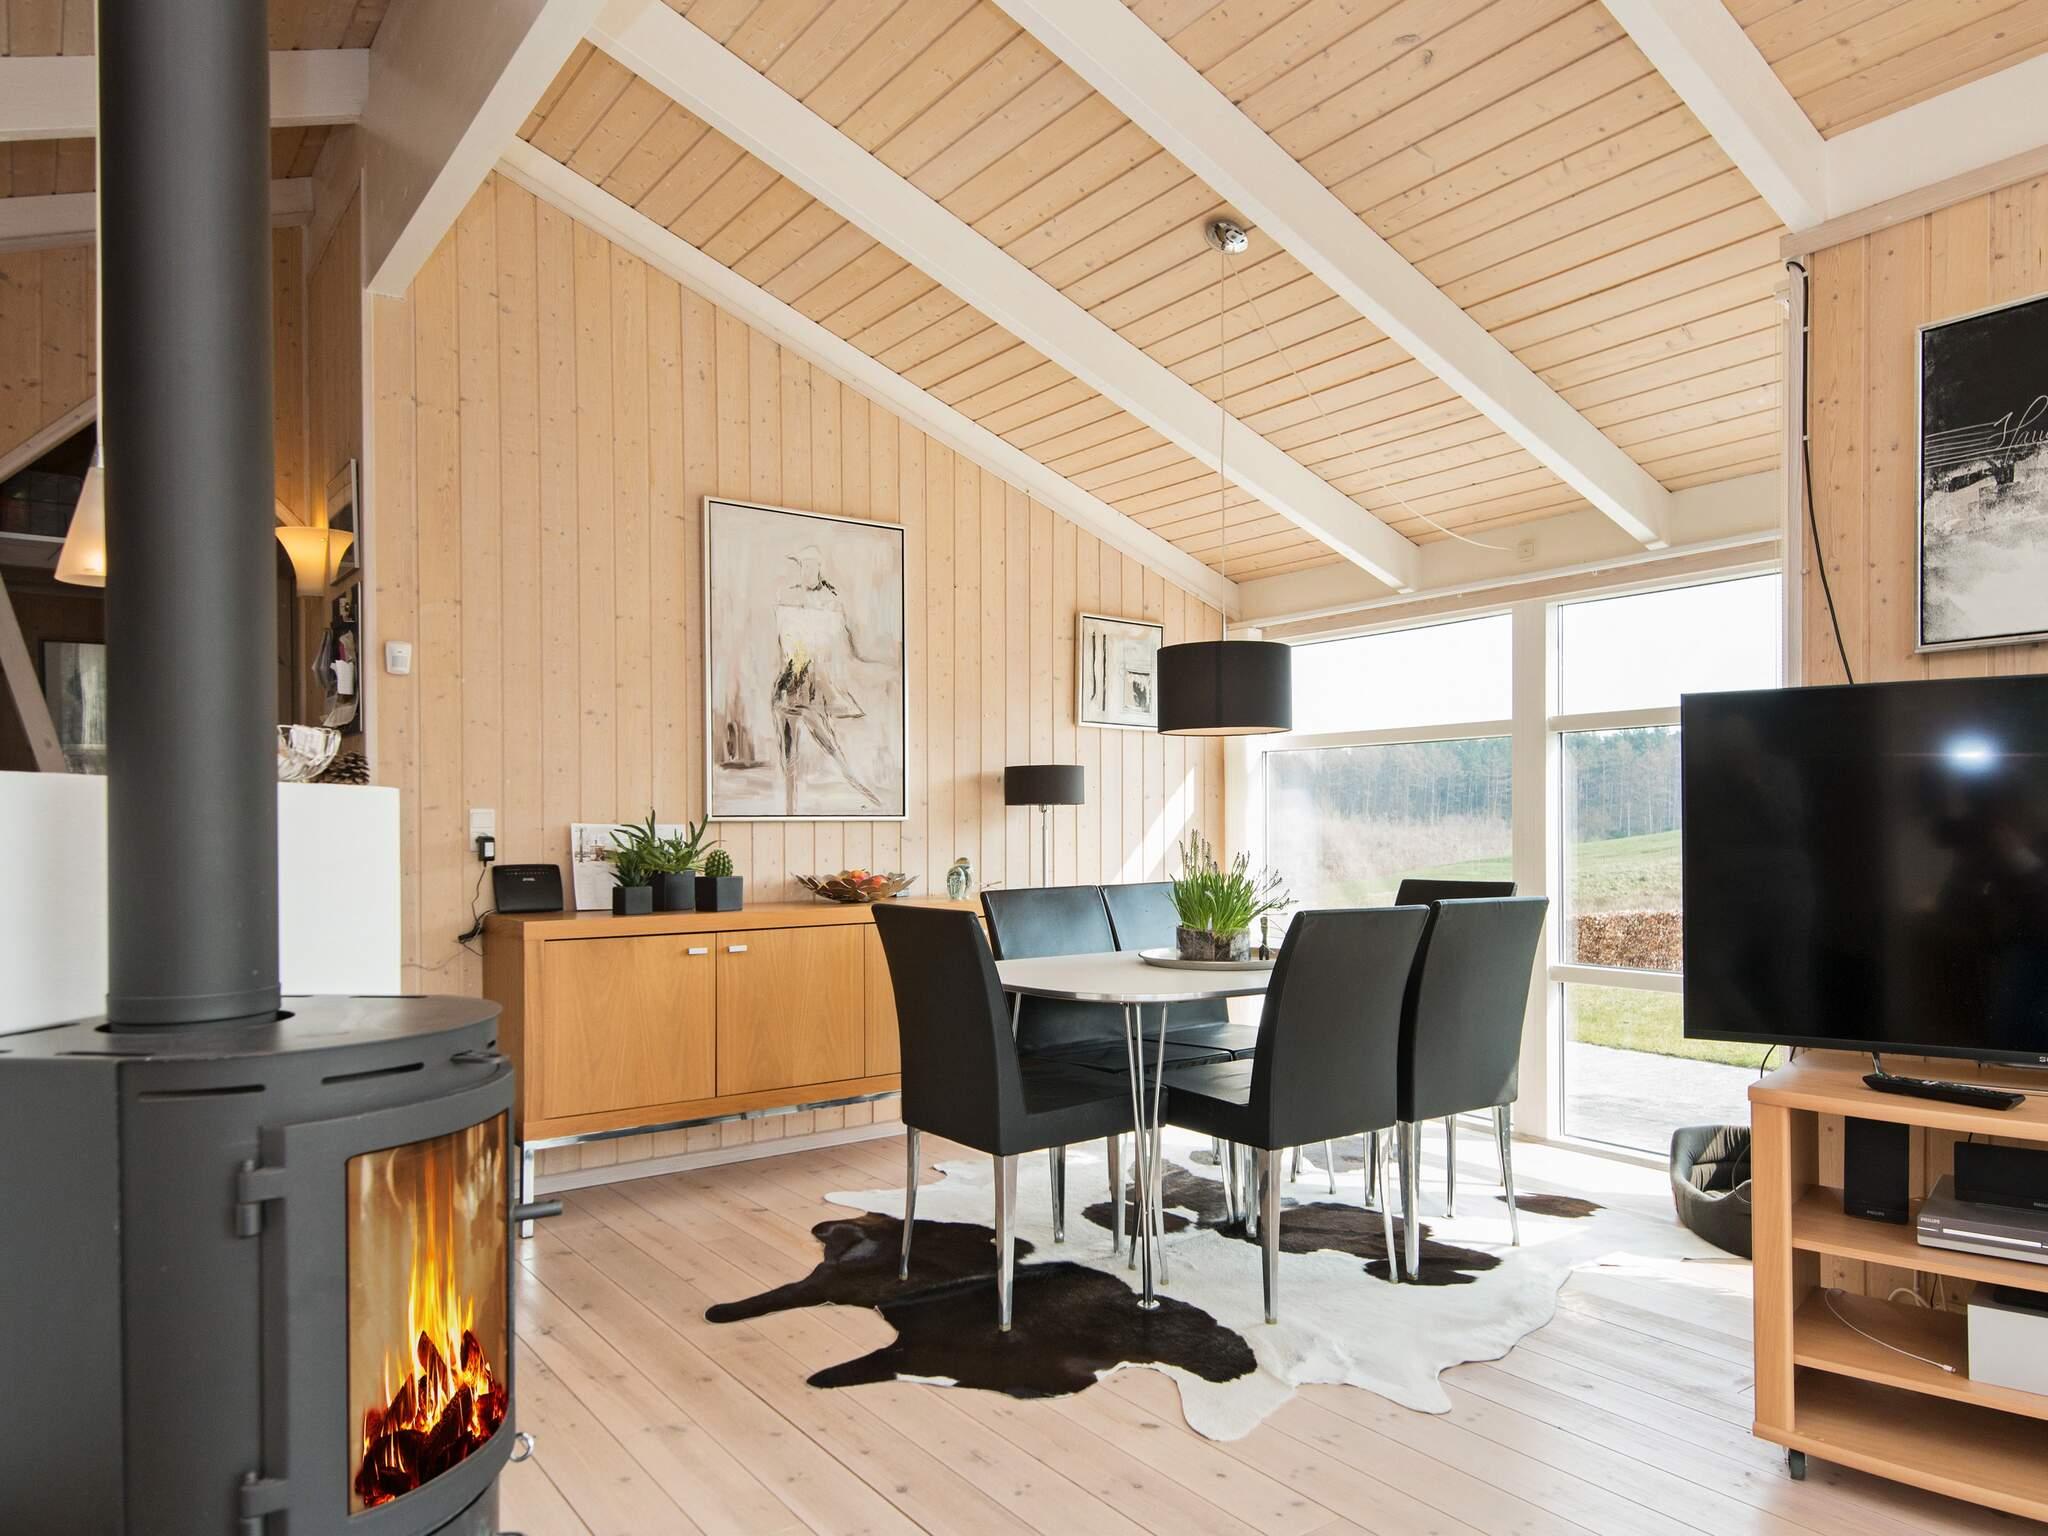 Ferienhaus Handrup Bakker (2581099), Handrup, , Ostjütland, Dänemark, Bild 3